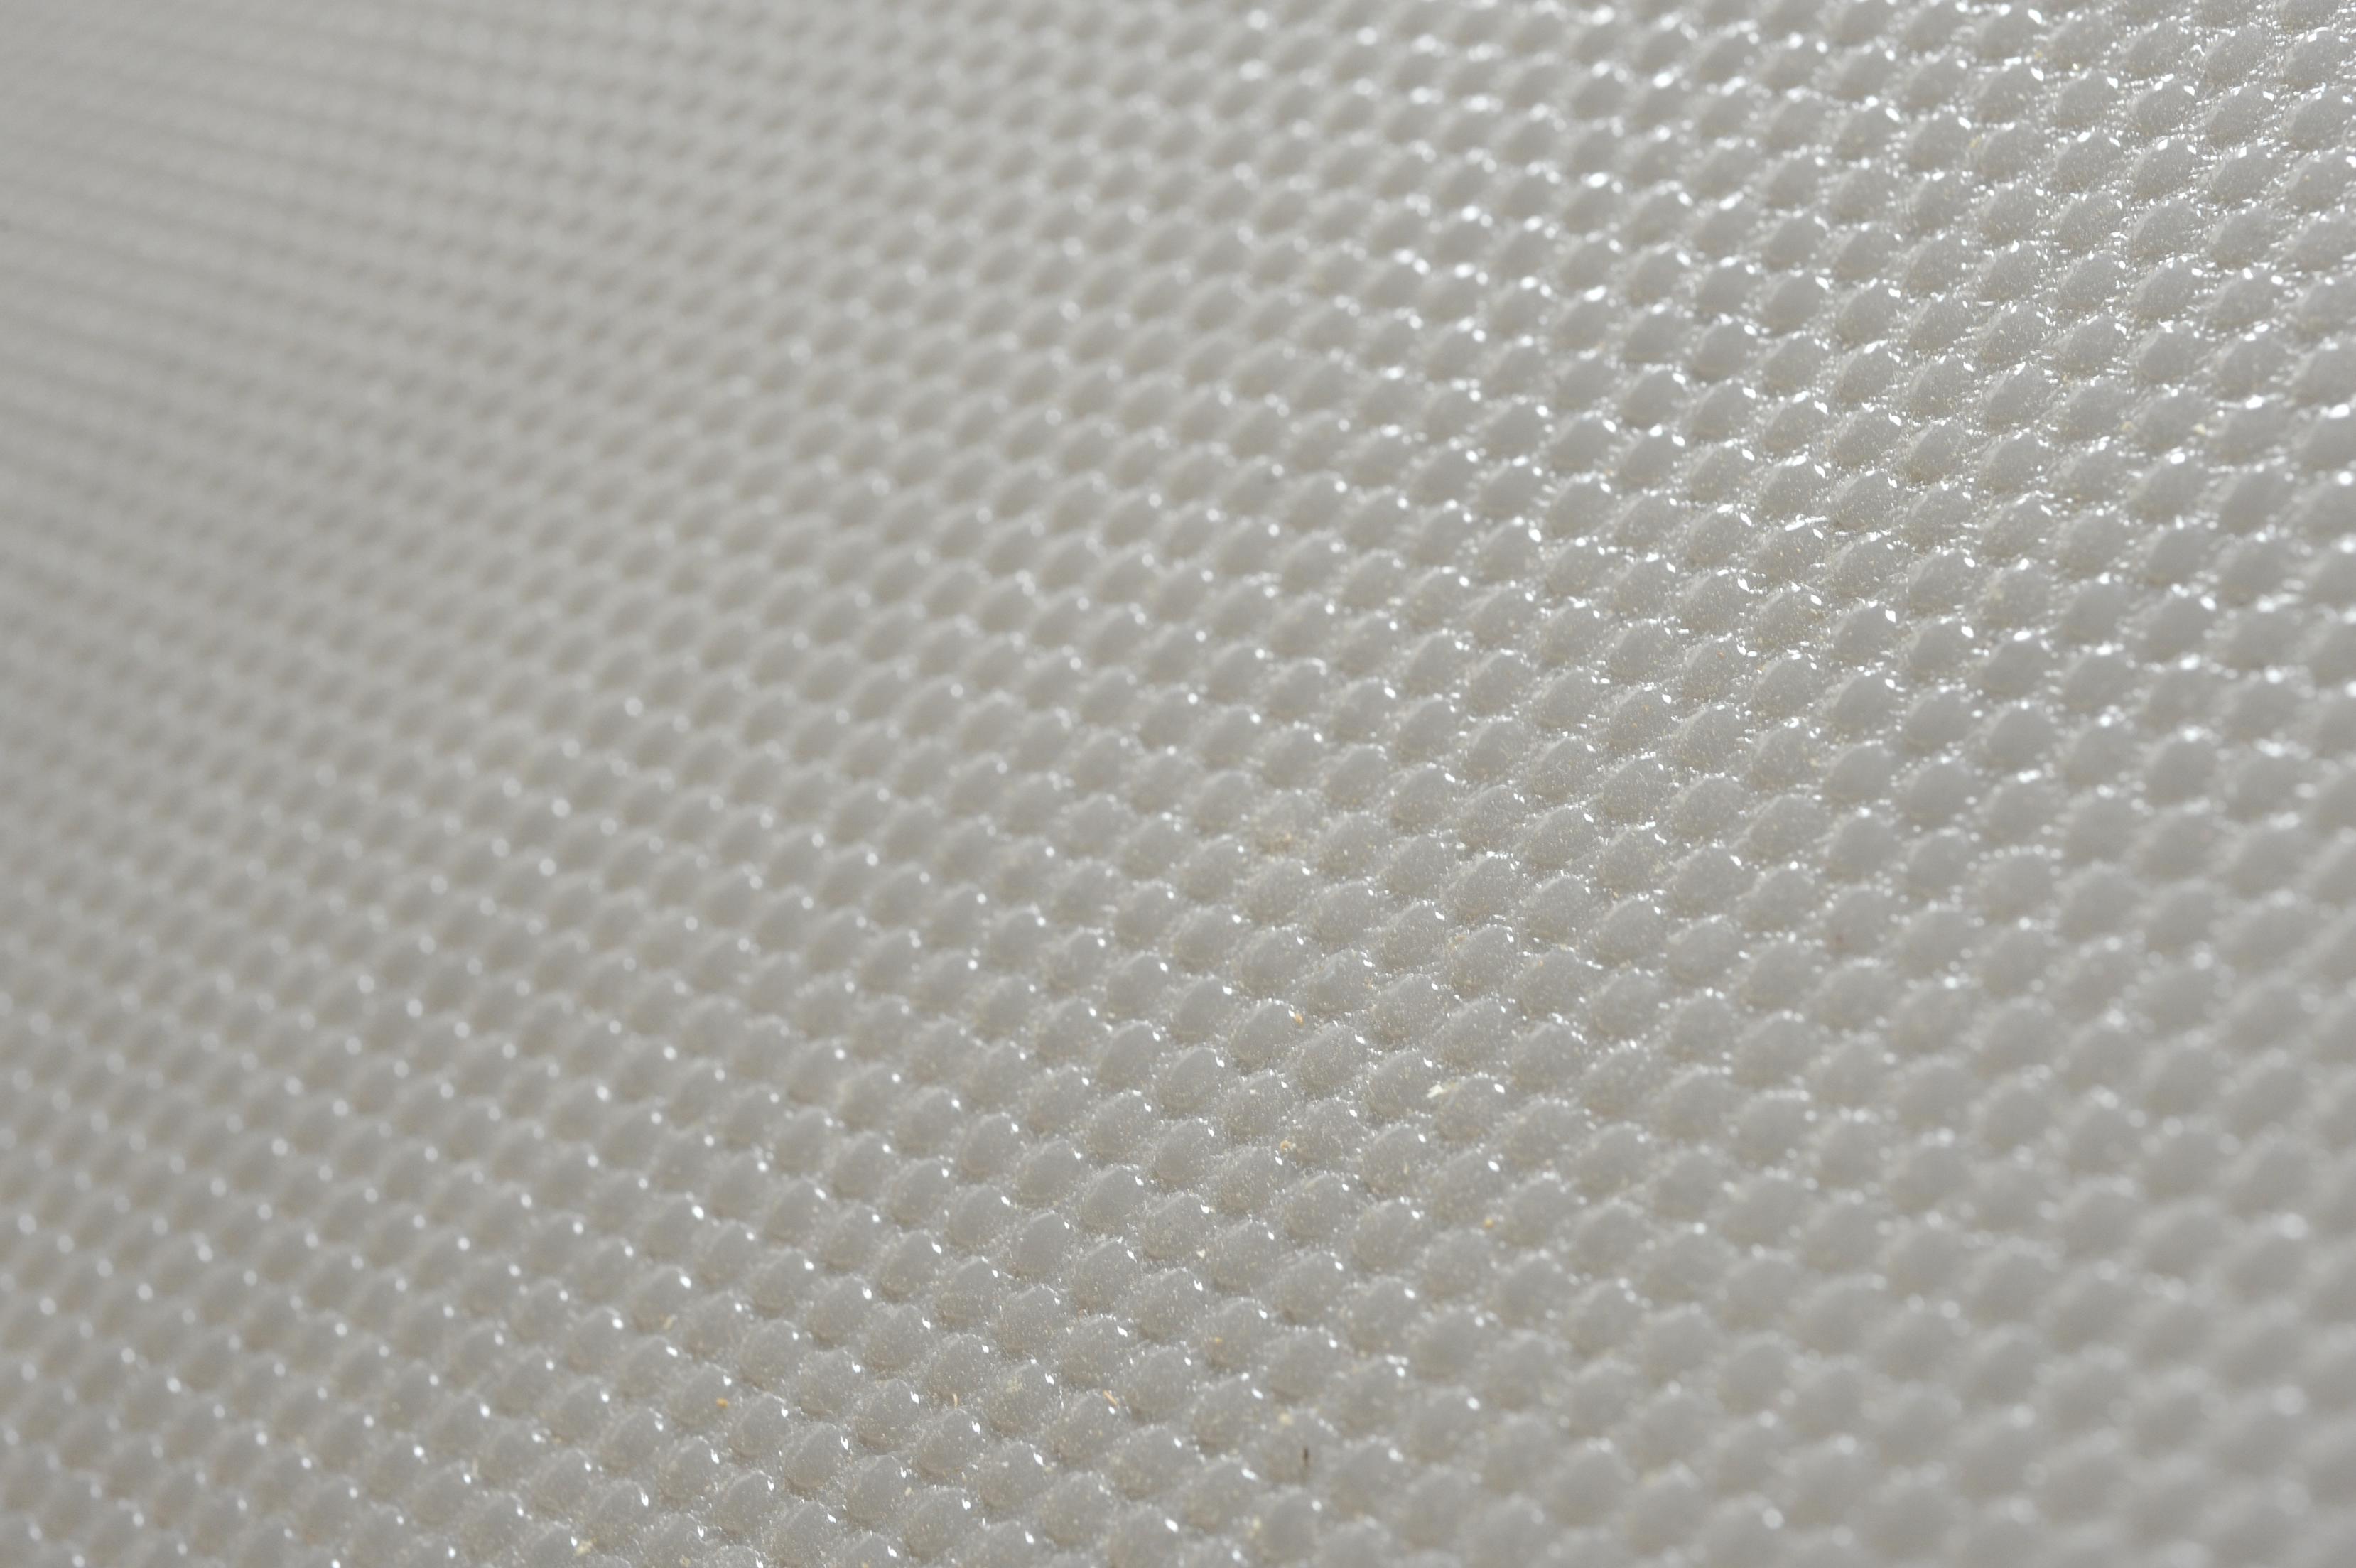 plastic material texture, plastic, download photo, plastic texture background